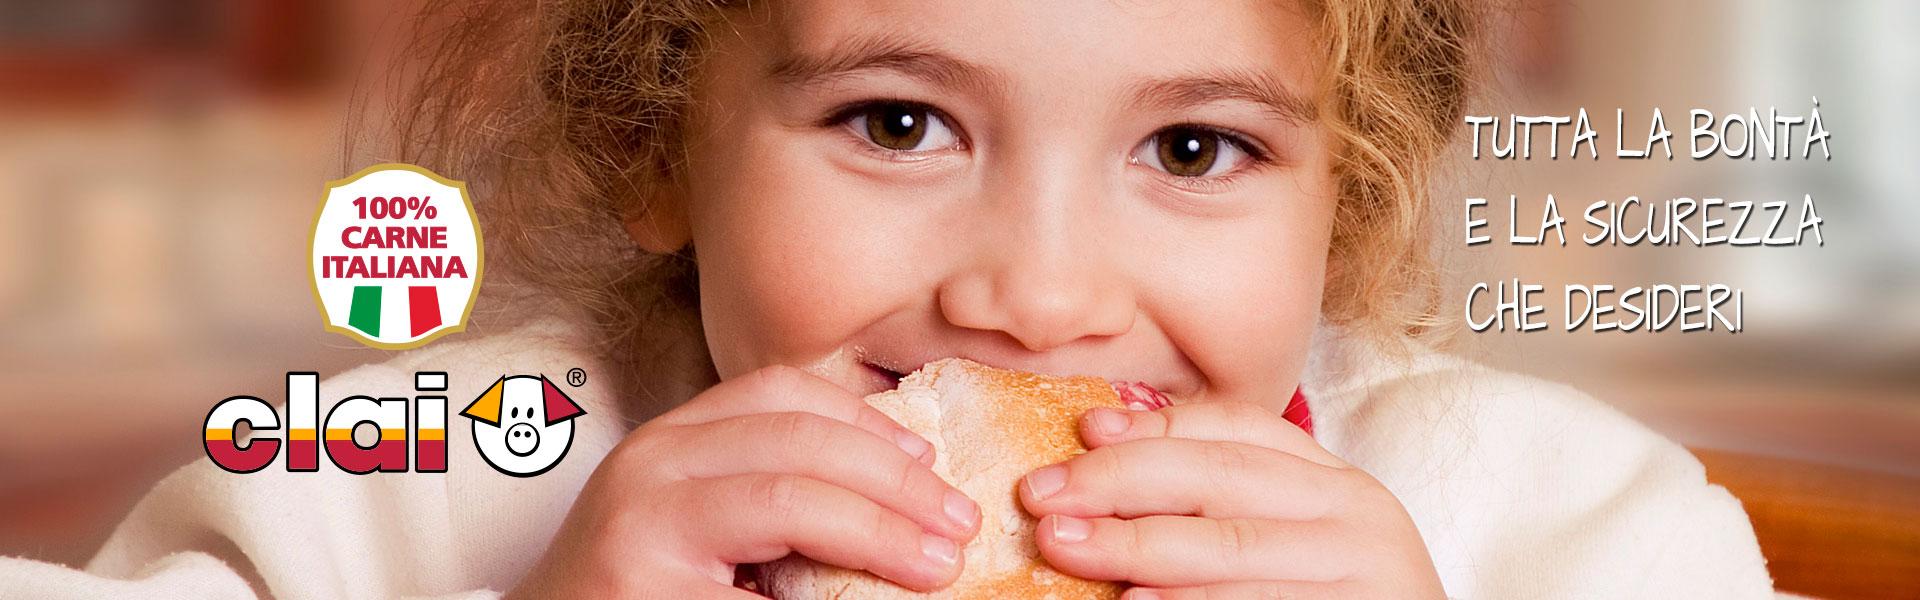 slider-clai-panino-salame